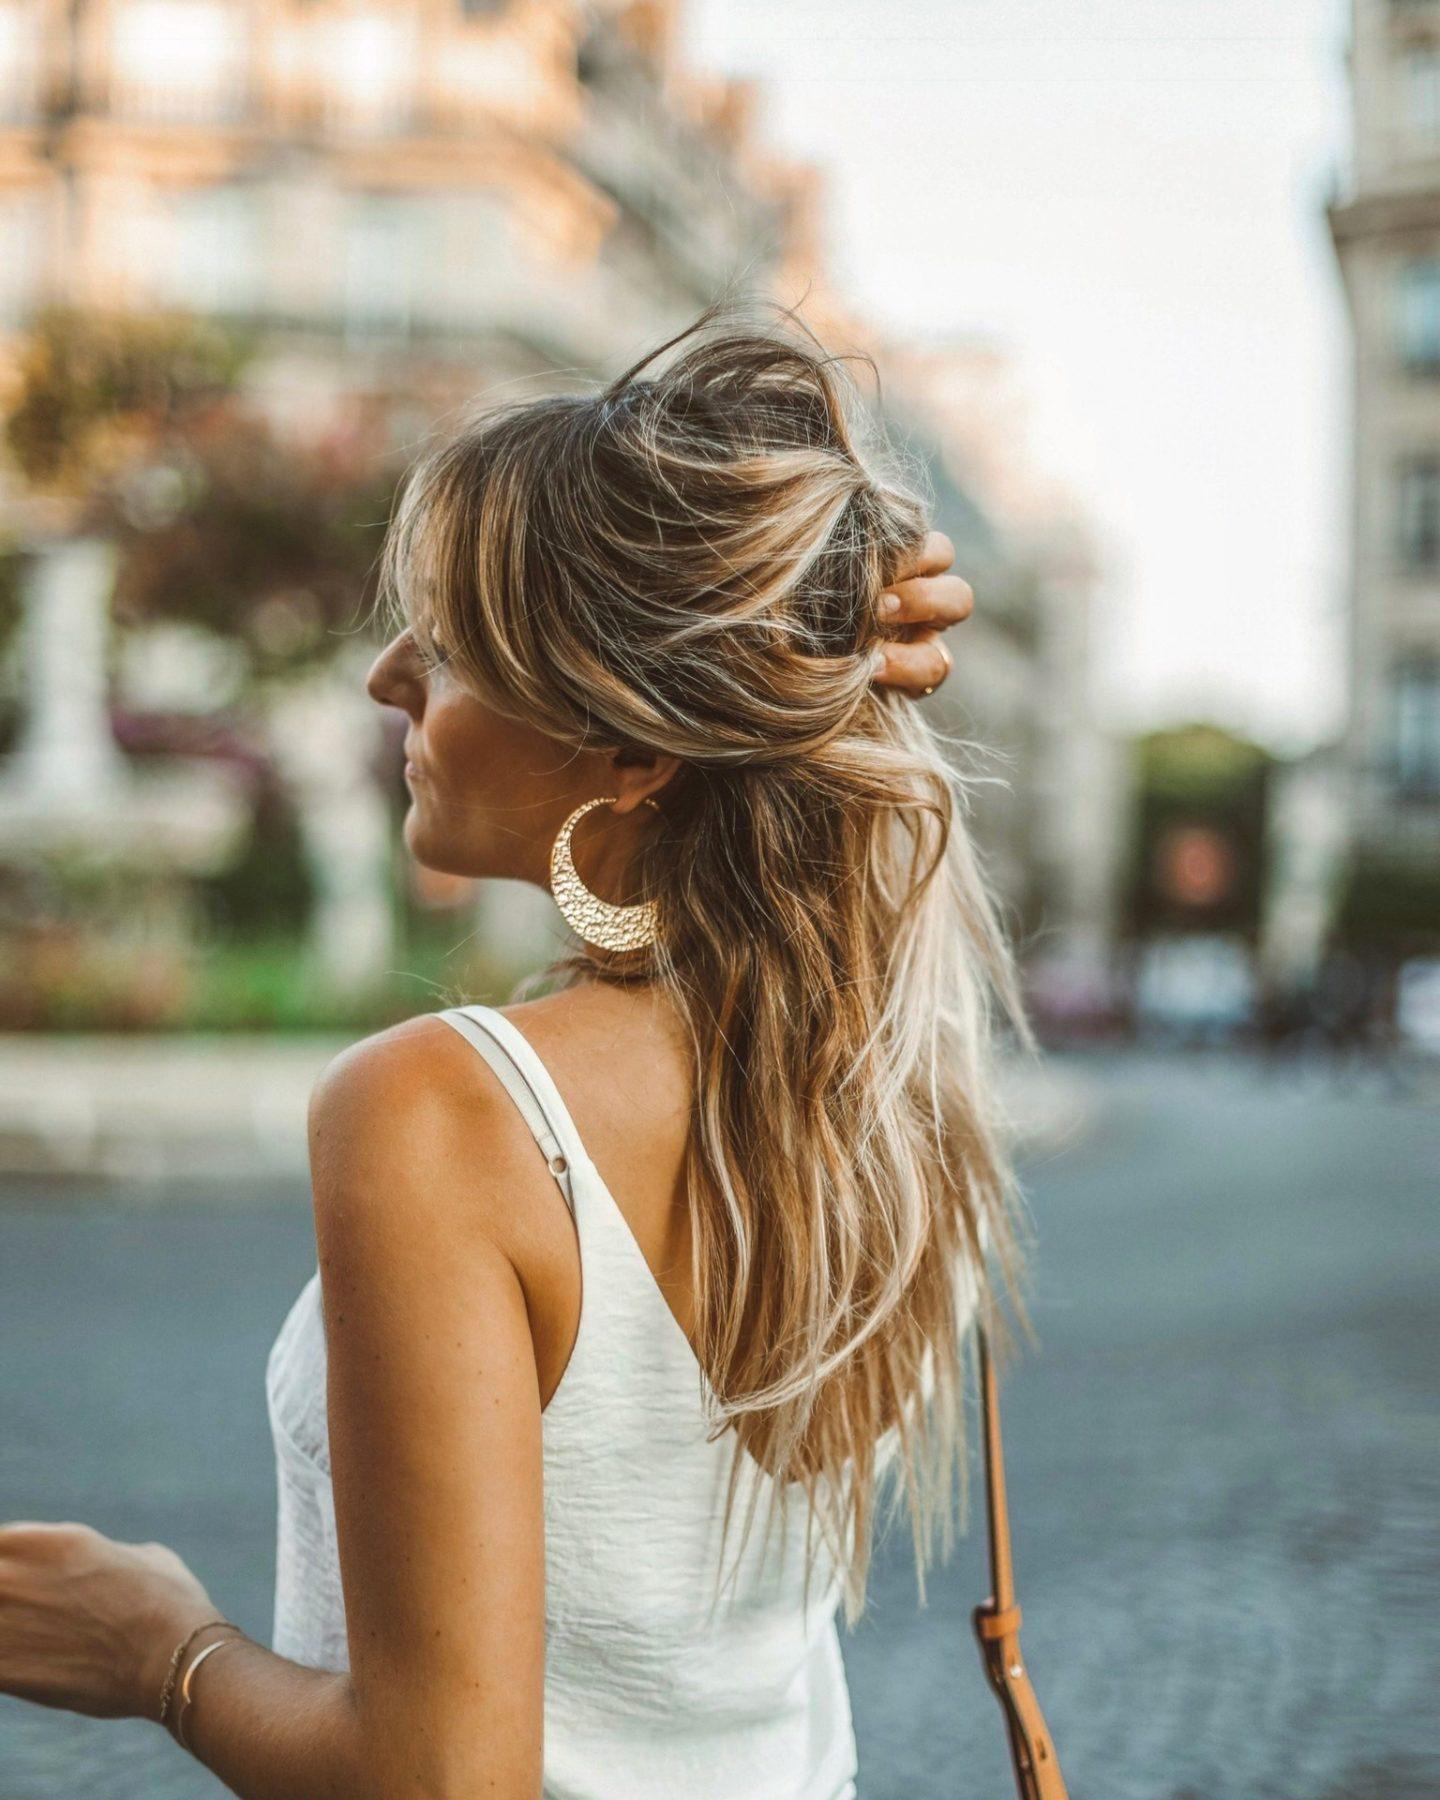 Helles Bijoux - Blondie Baby blog mode Paris et voyages